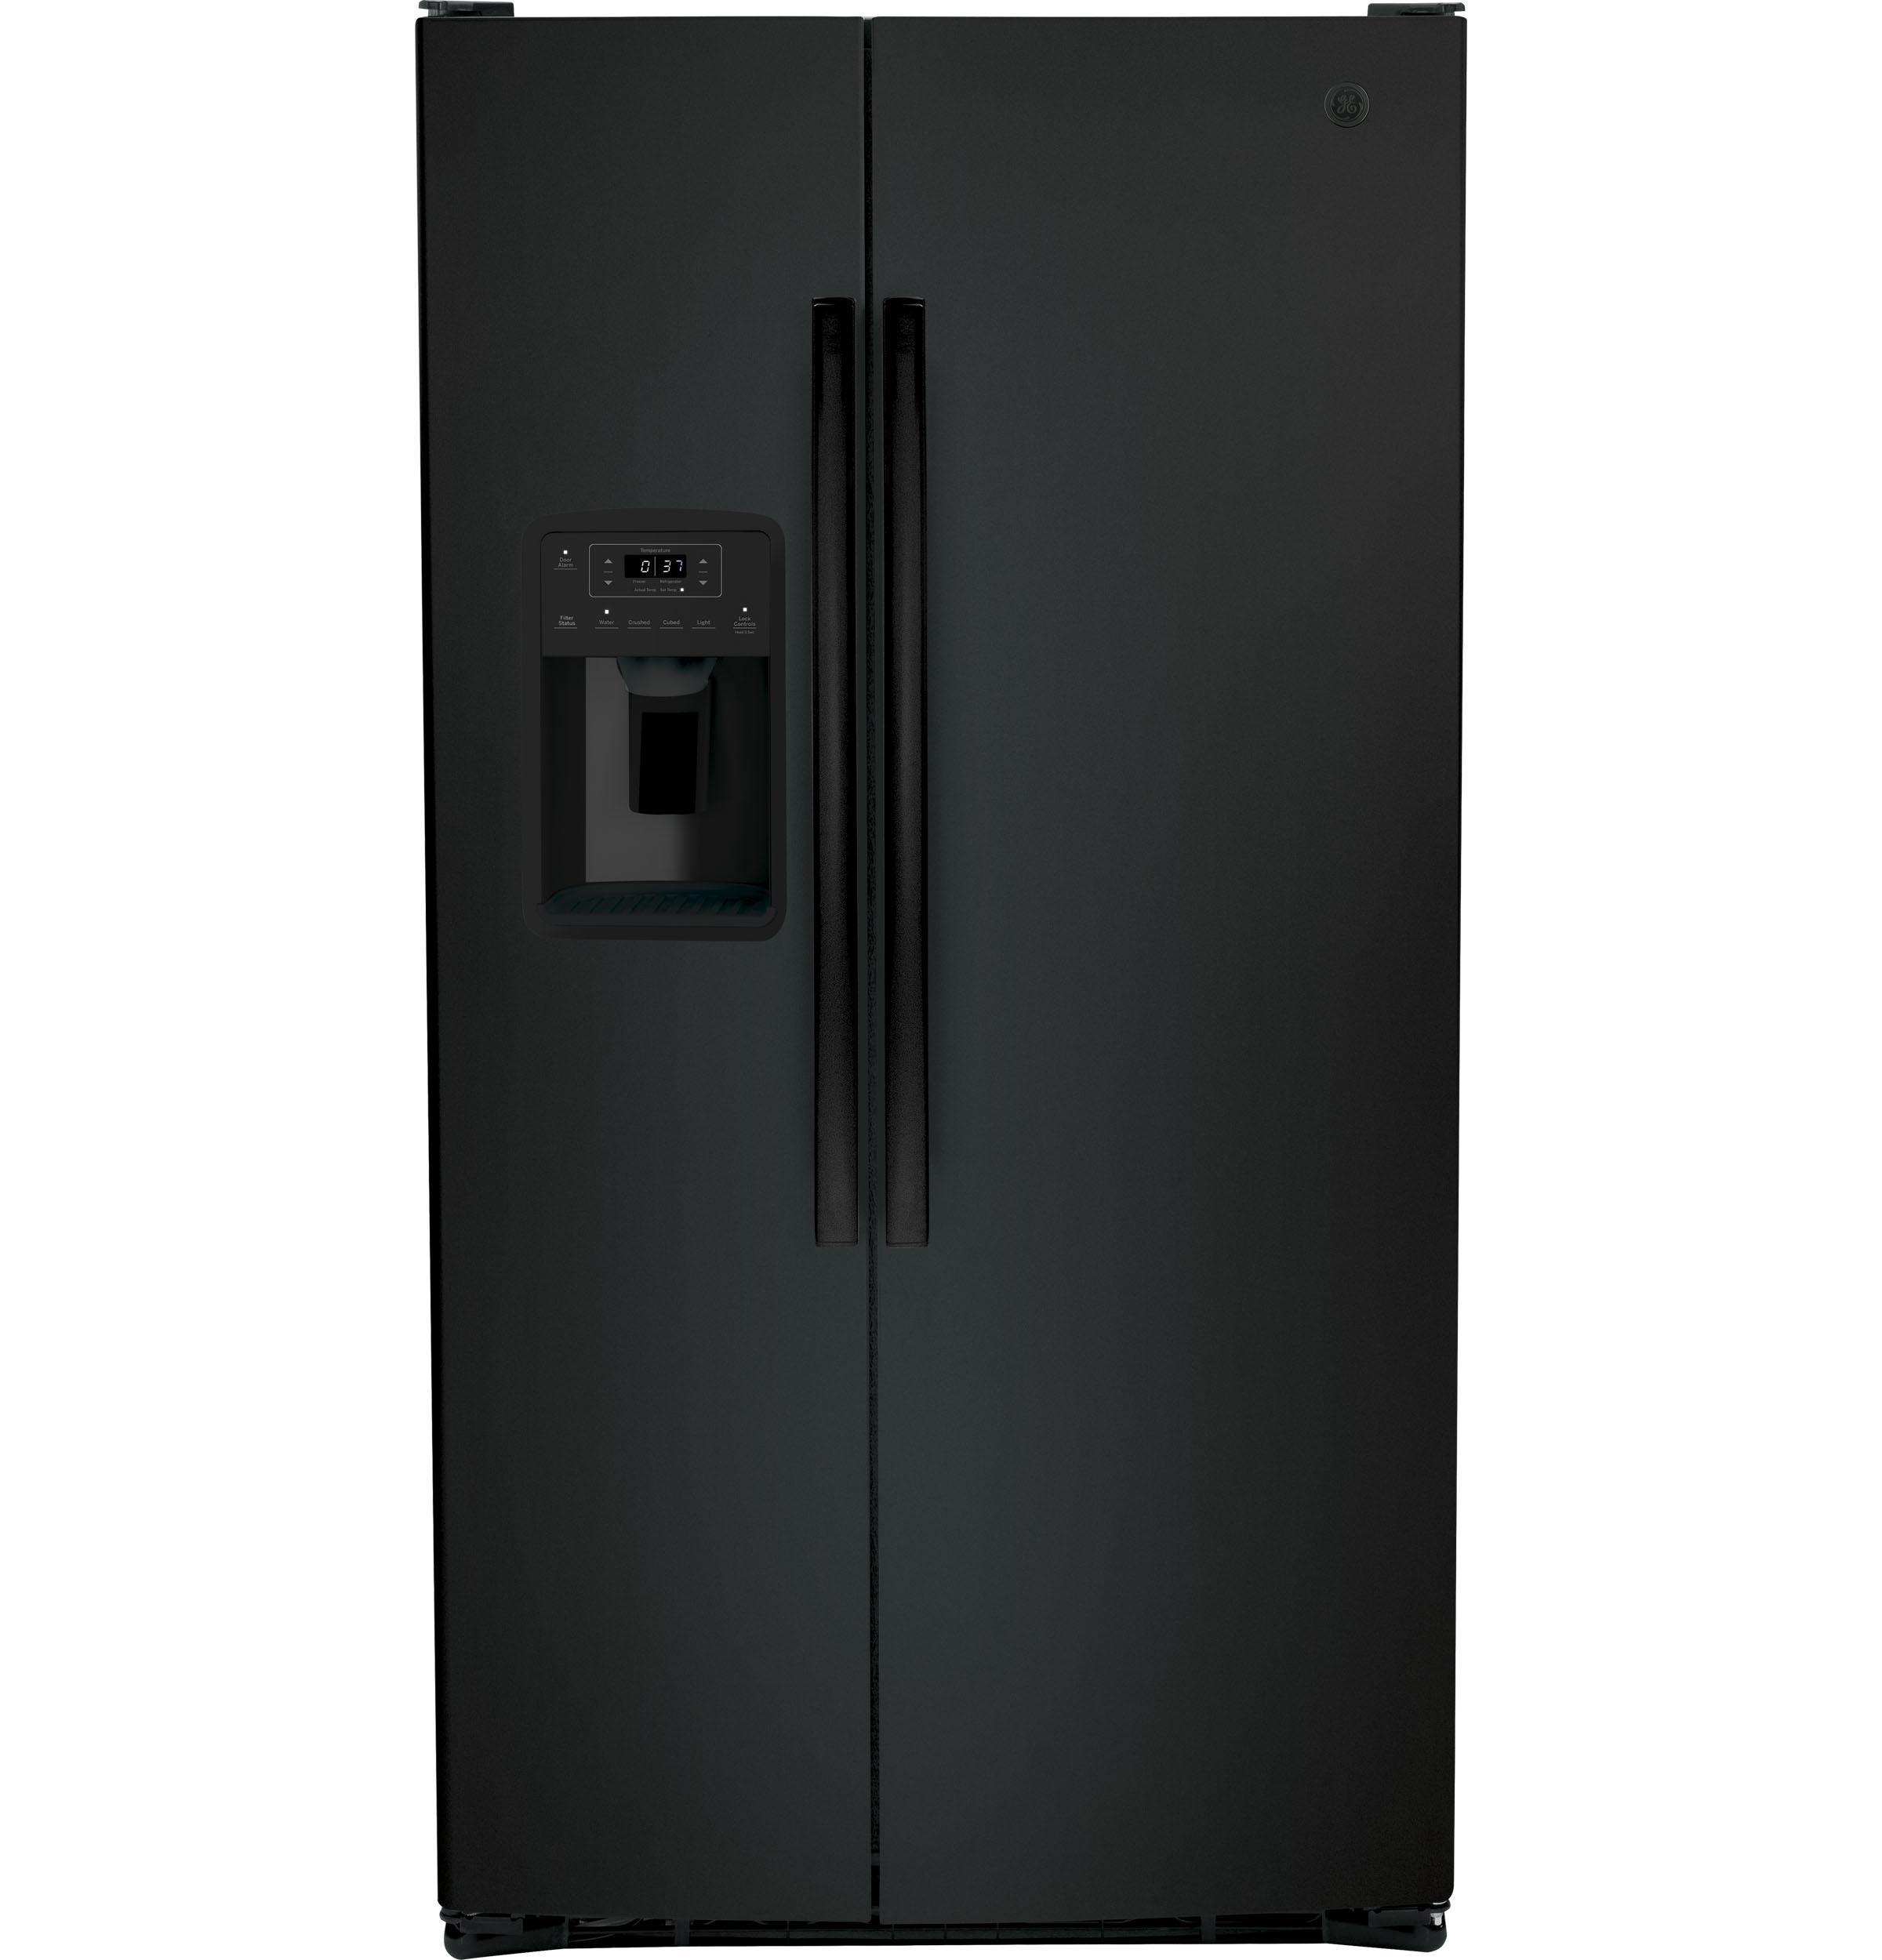 ®ENERGY STAR® 25.3 Cu. Ft. Side-By-Side Refrigerator